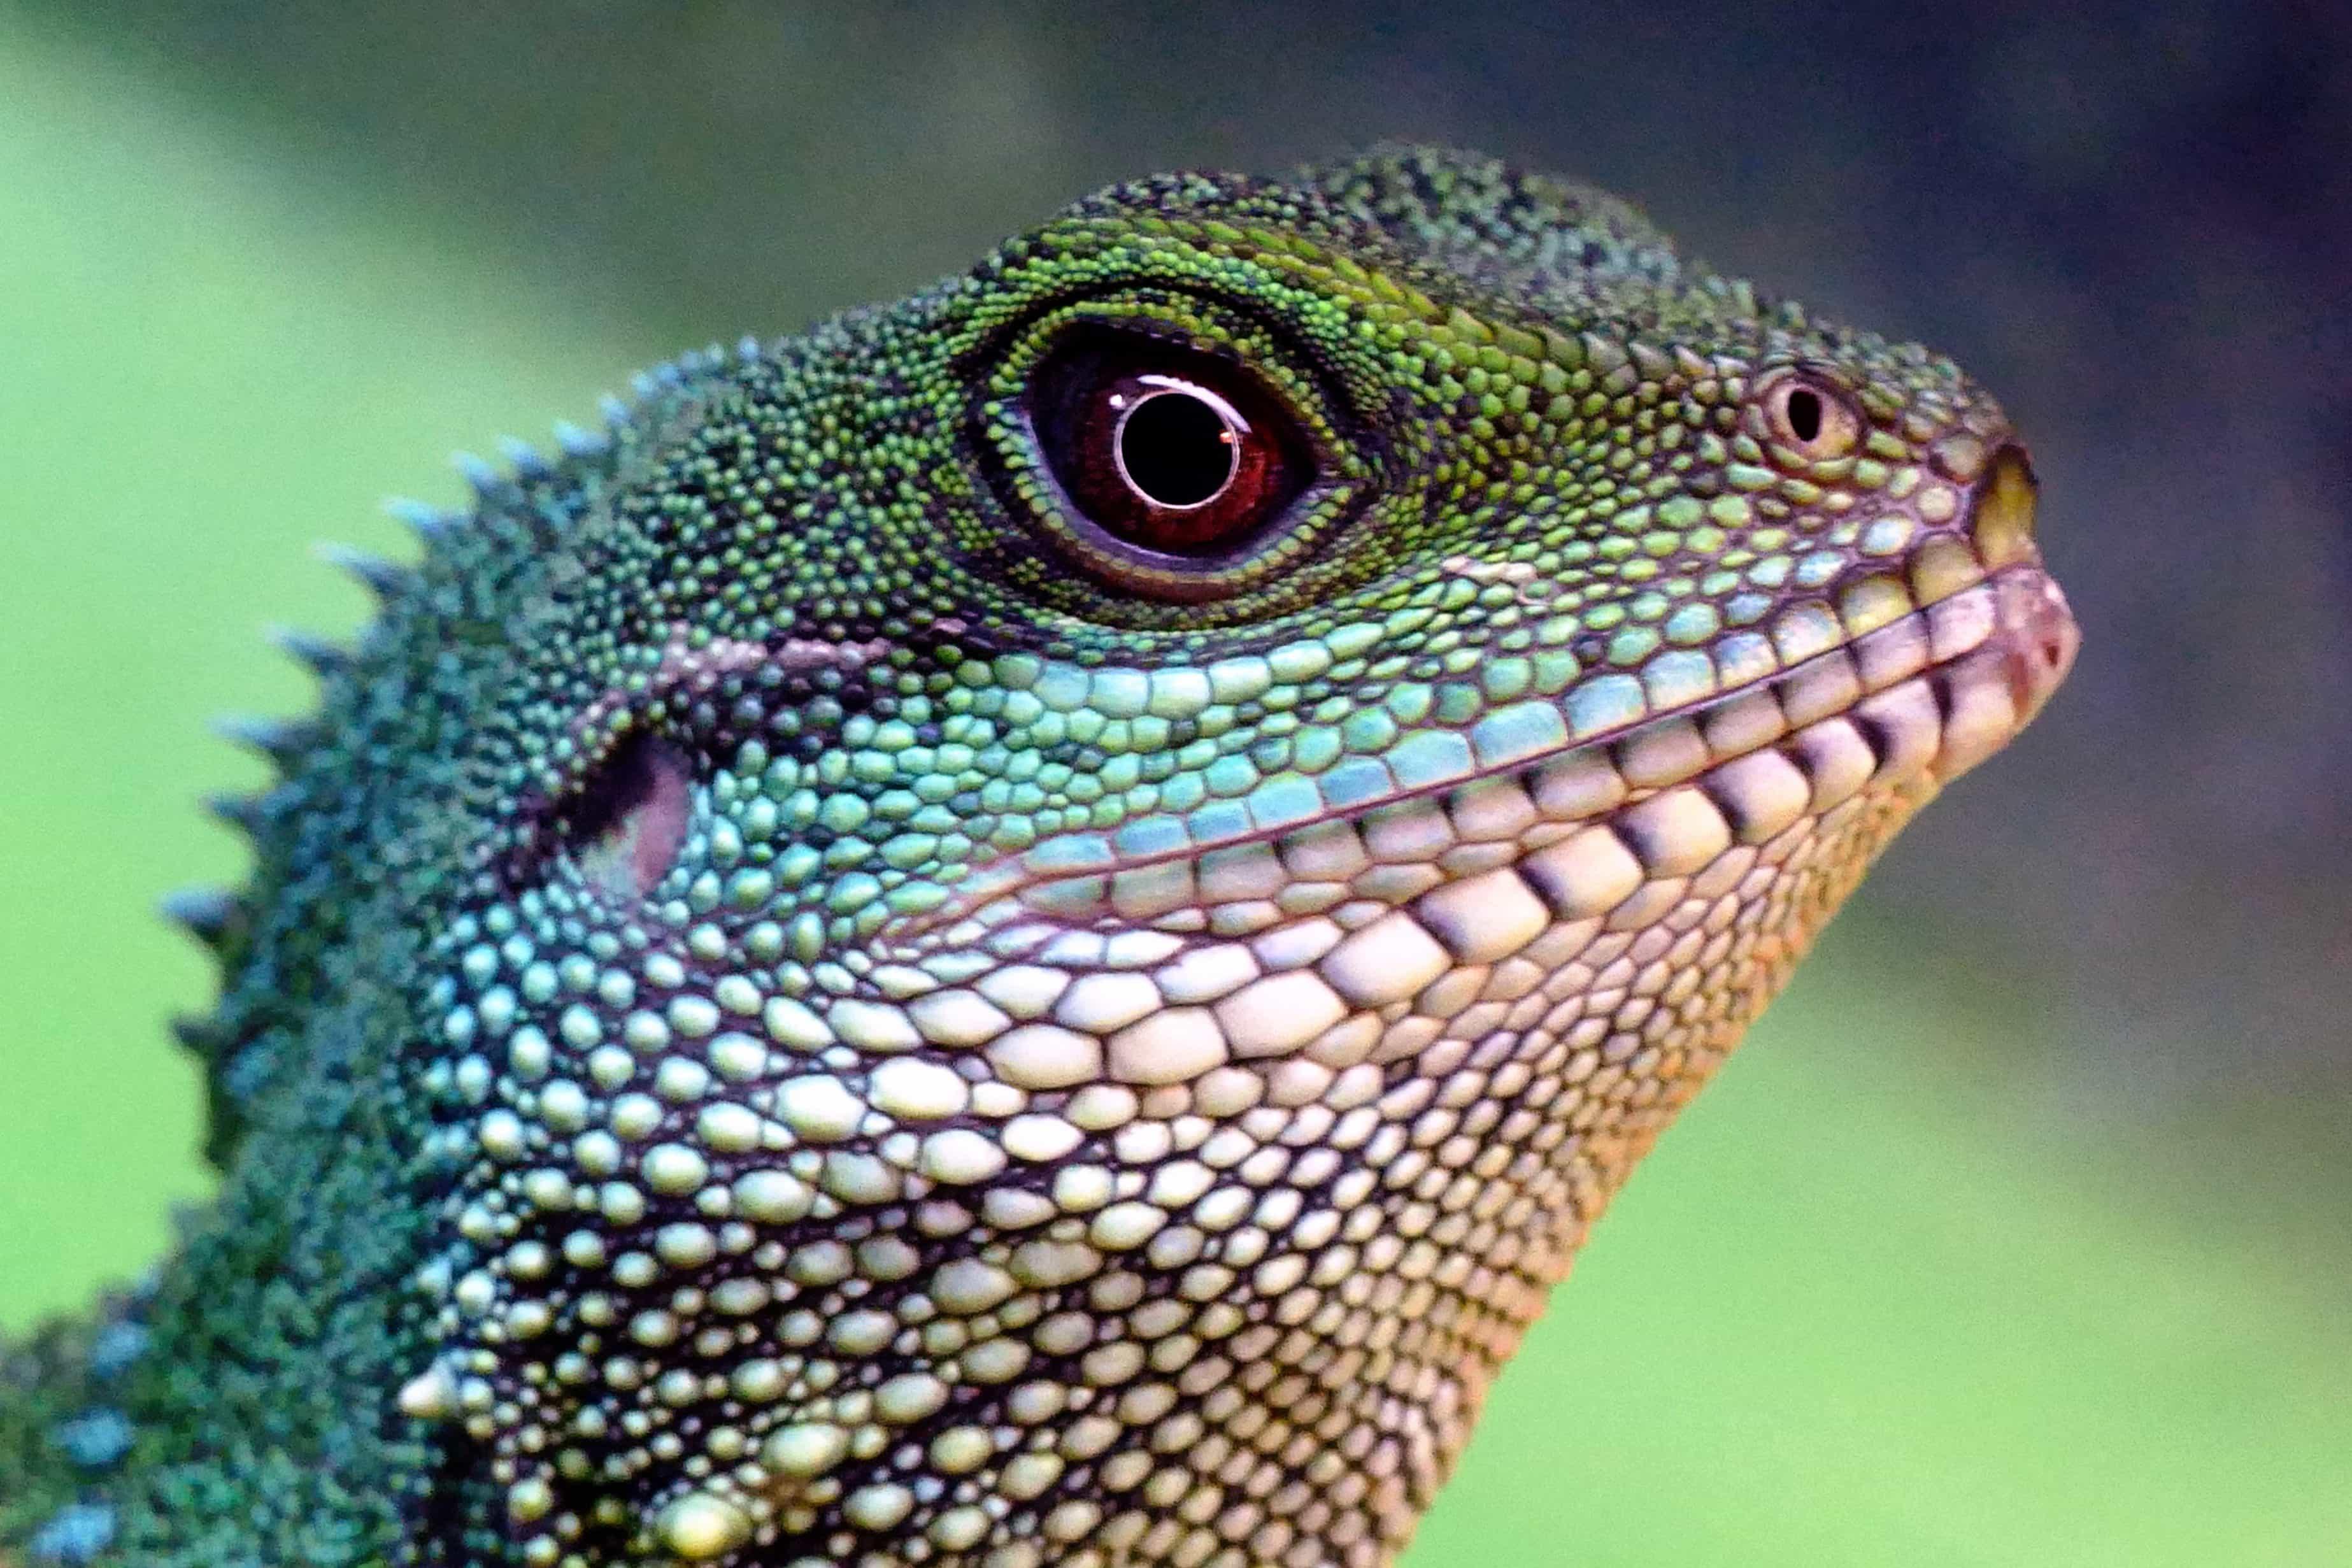 Dragon Wallpaper Hd Free Picture Lizard Reptile Wildlife Nature